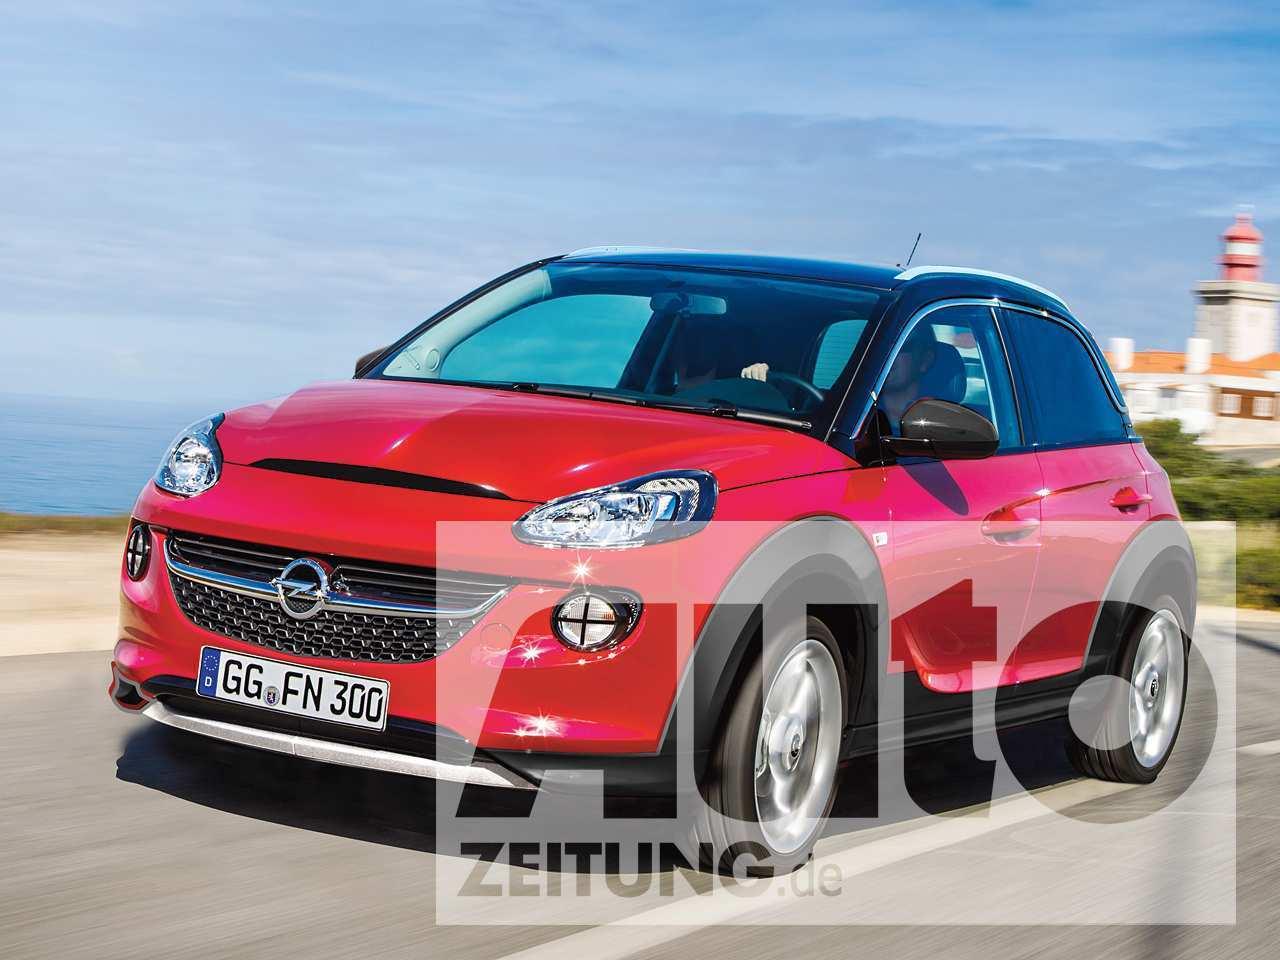 28 New Opel Modelle 2020 Overview for Opel Modelle 2020